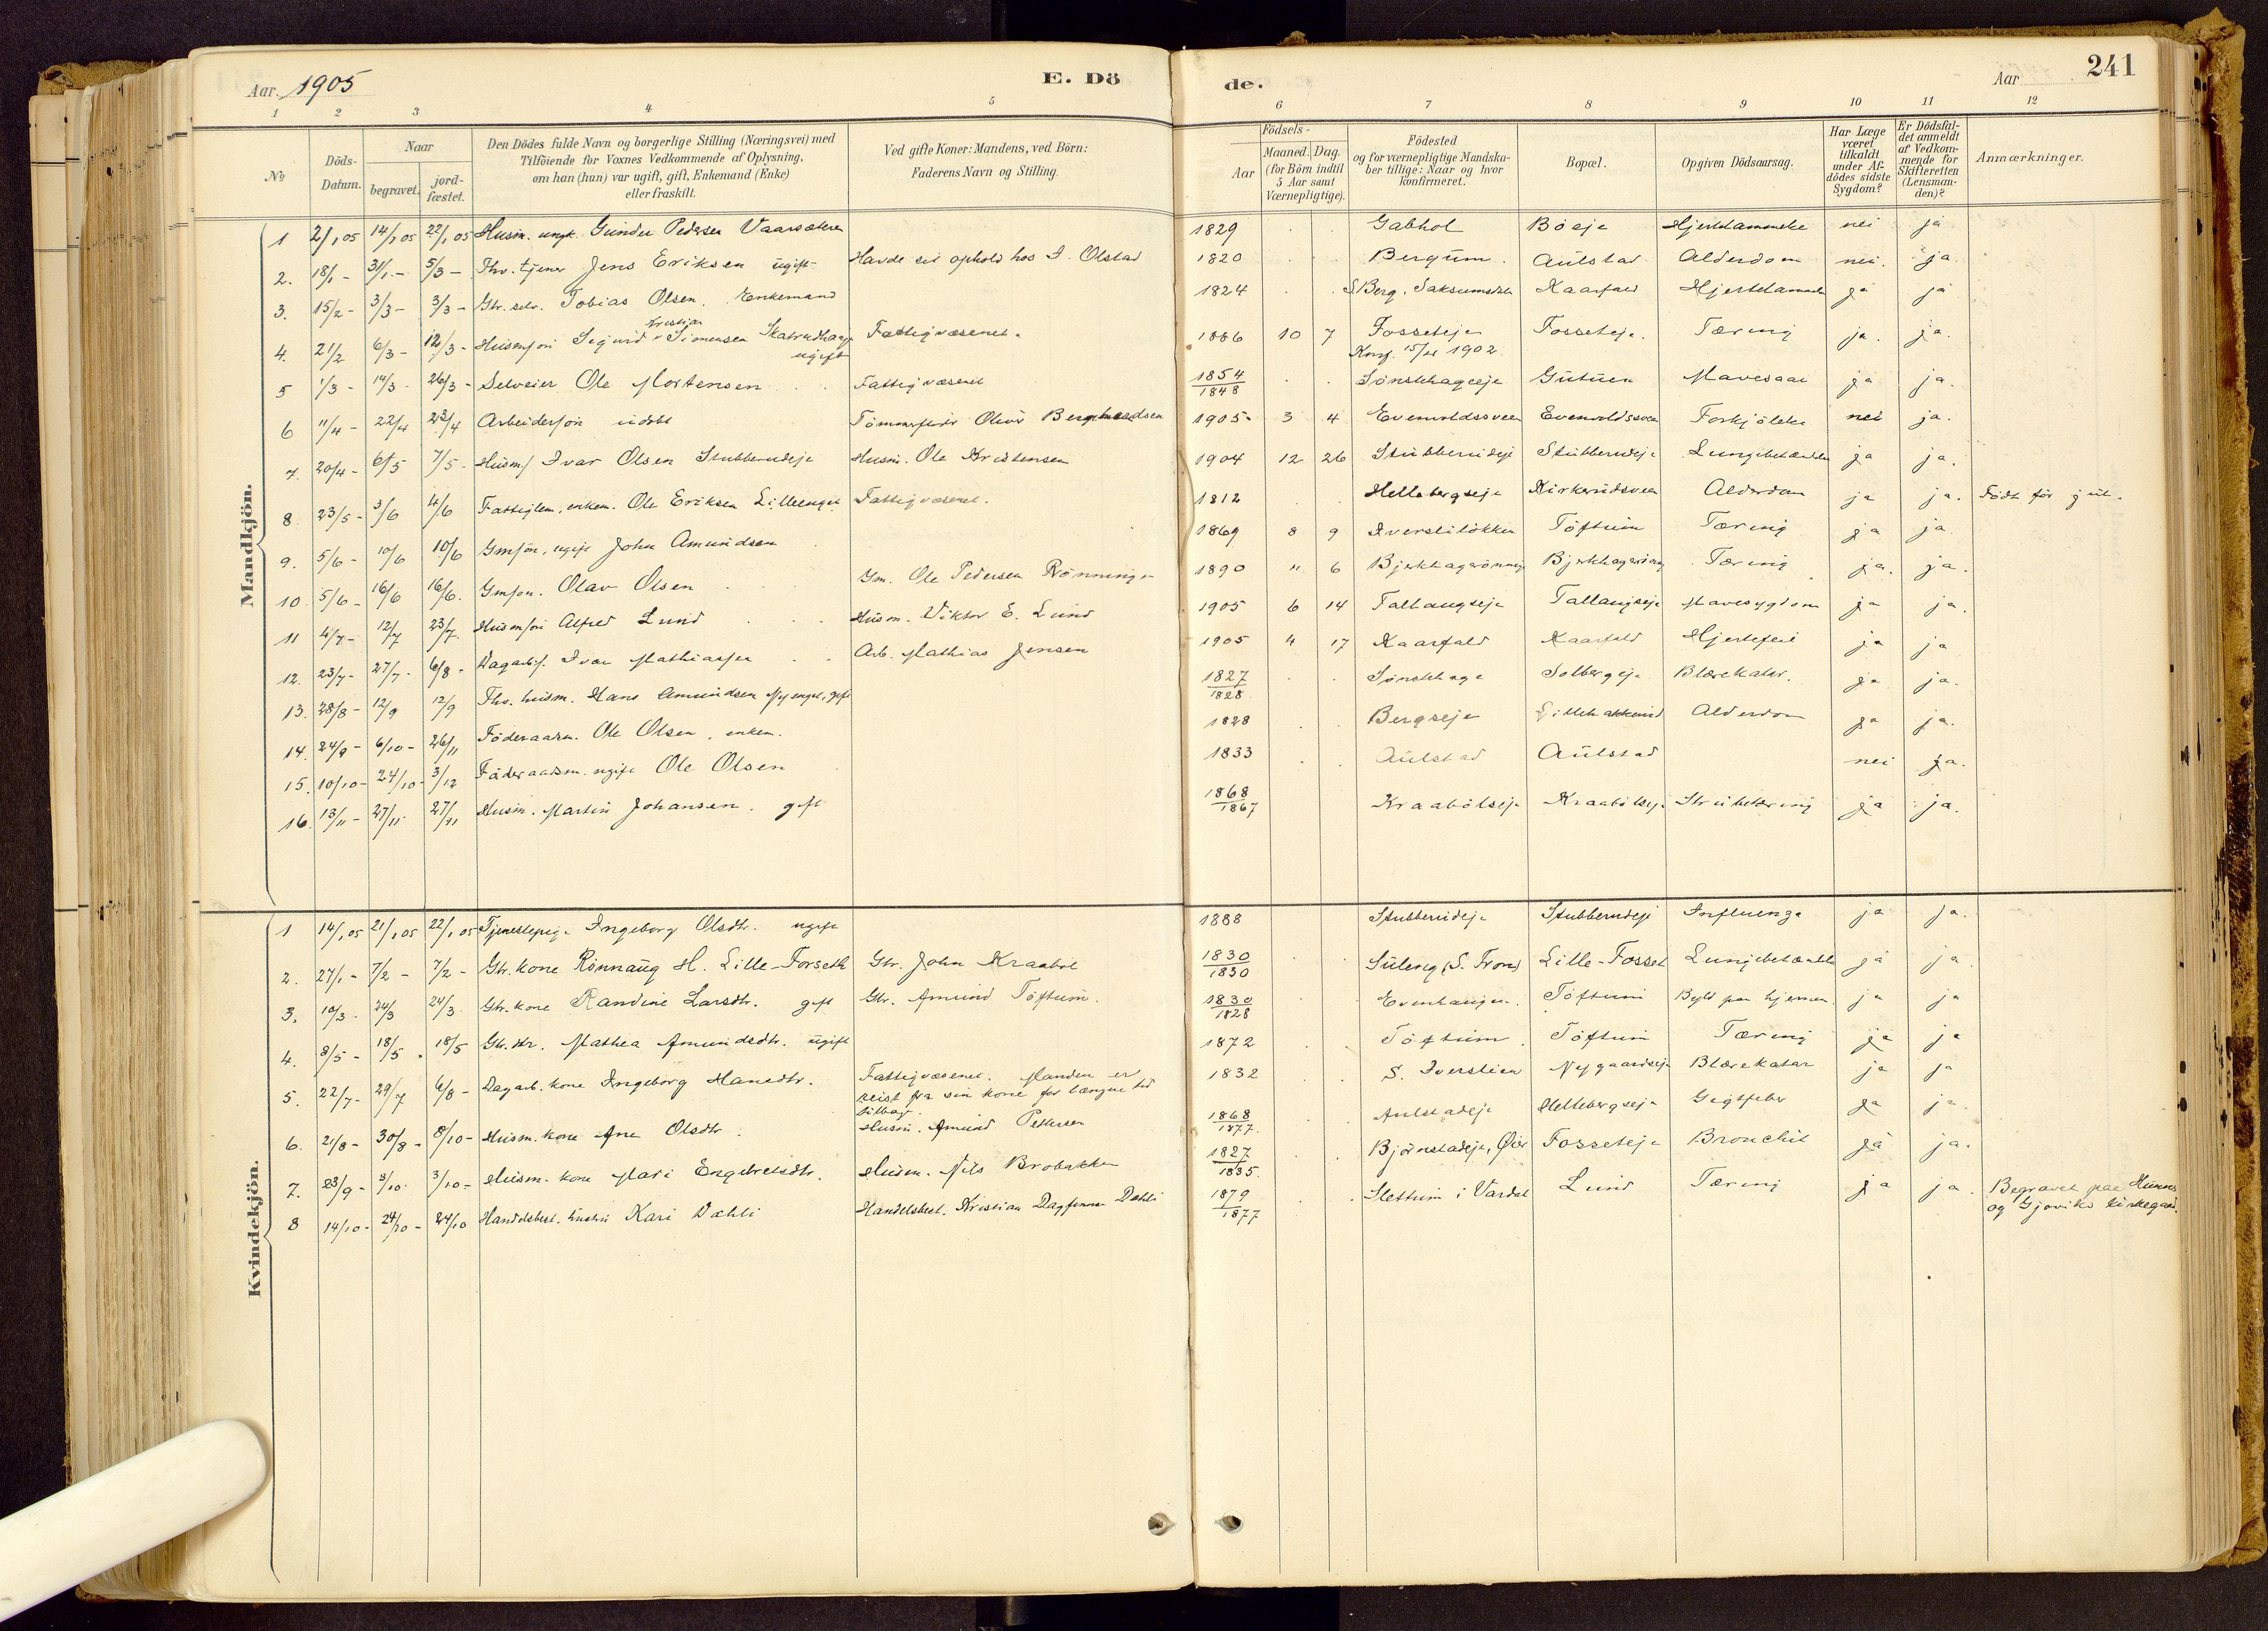 SAH, Vestre Gausdal prestekontor, Ministerialbok nr. 1, 1887-1914, s. 241